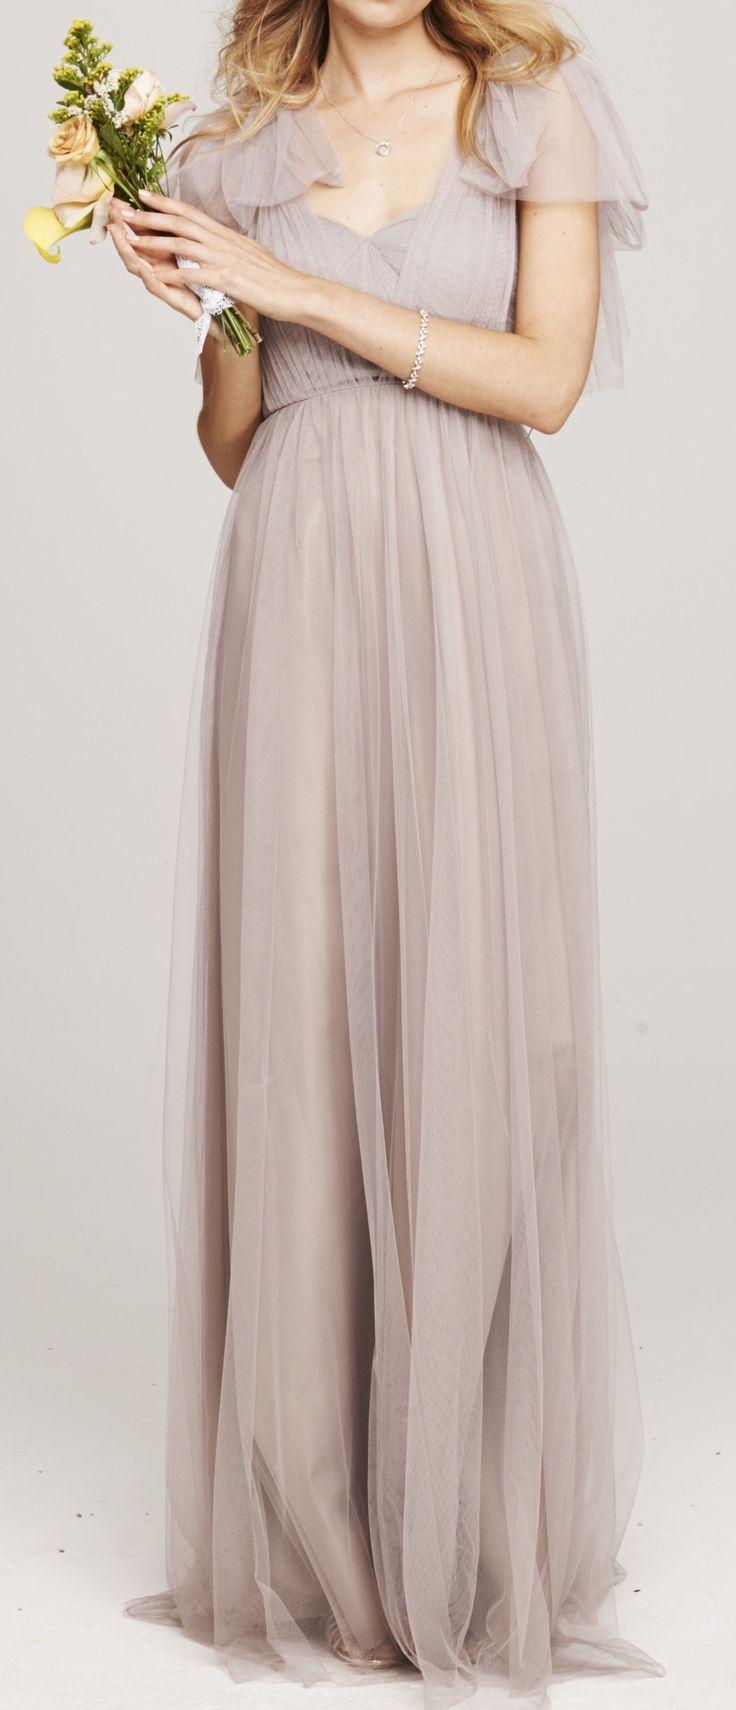 Grey Tulle Bridesmaid Dress